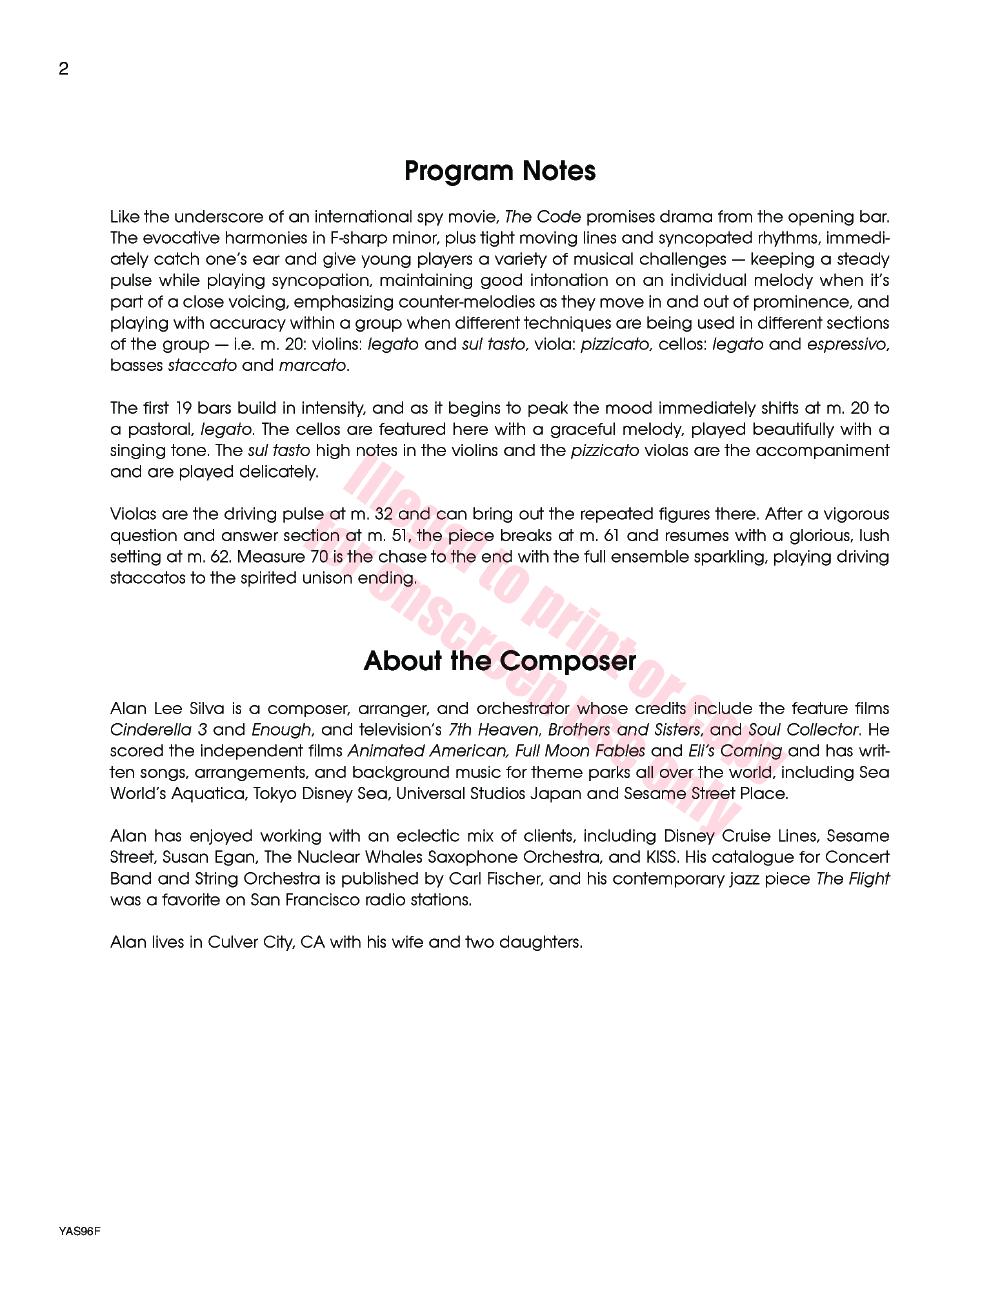 The Code by Alan Lee Silva| J W  Pepper Sheet Music